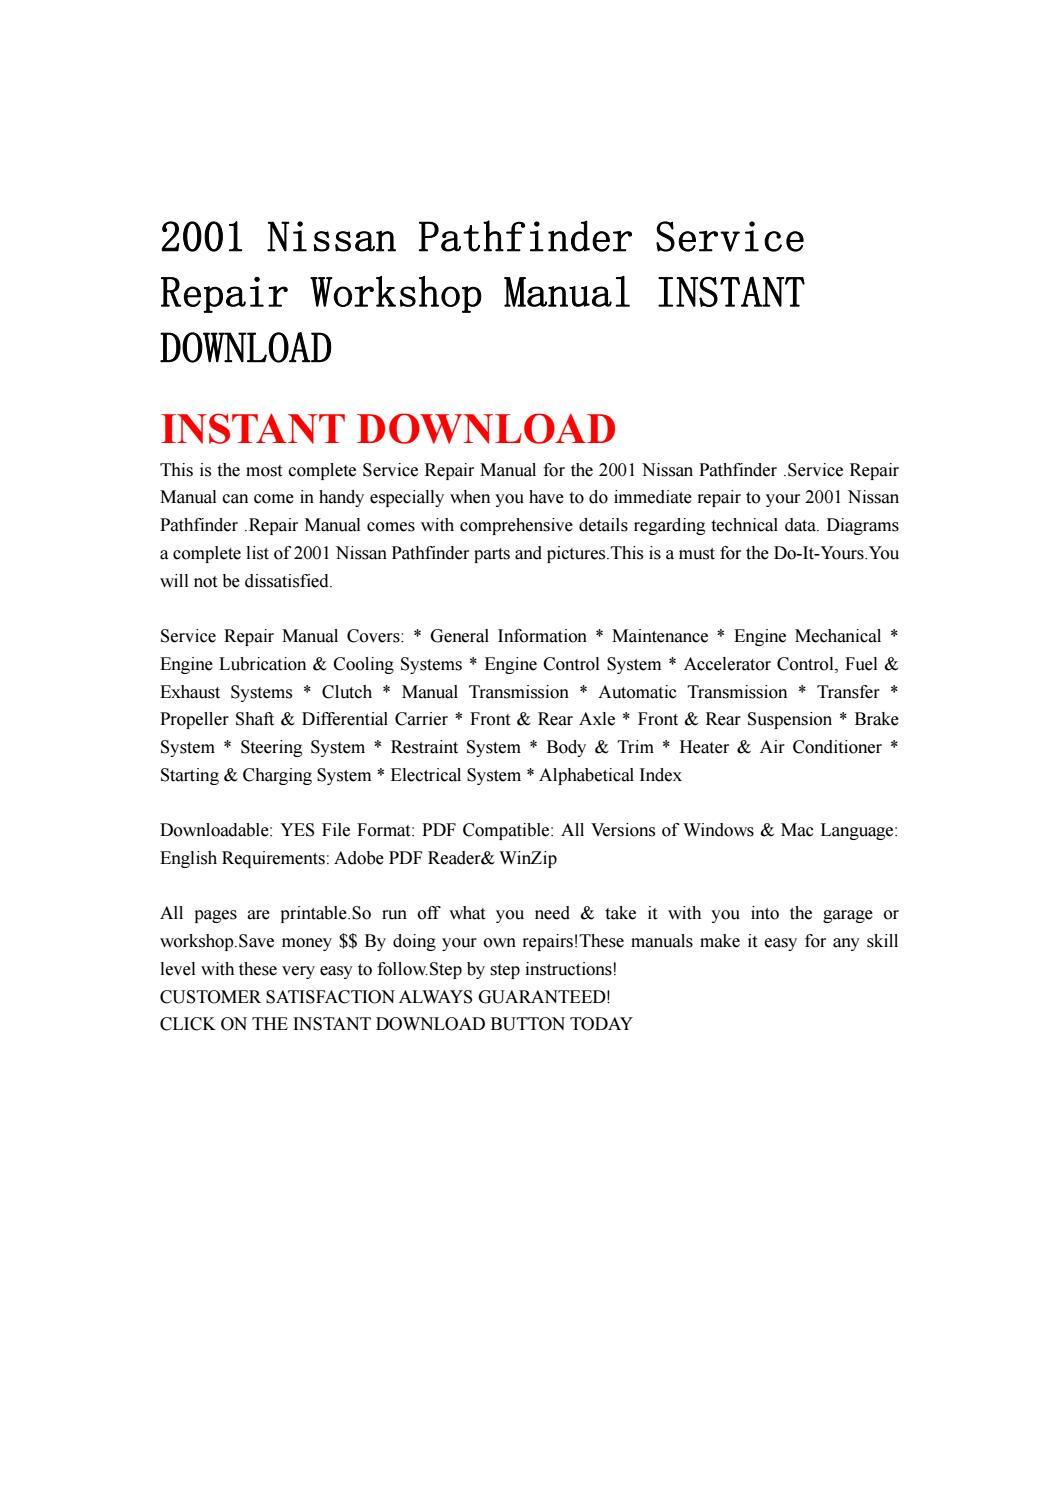 2001 nissan pathfinder engine manual